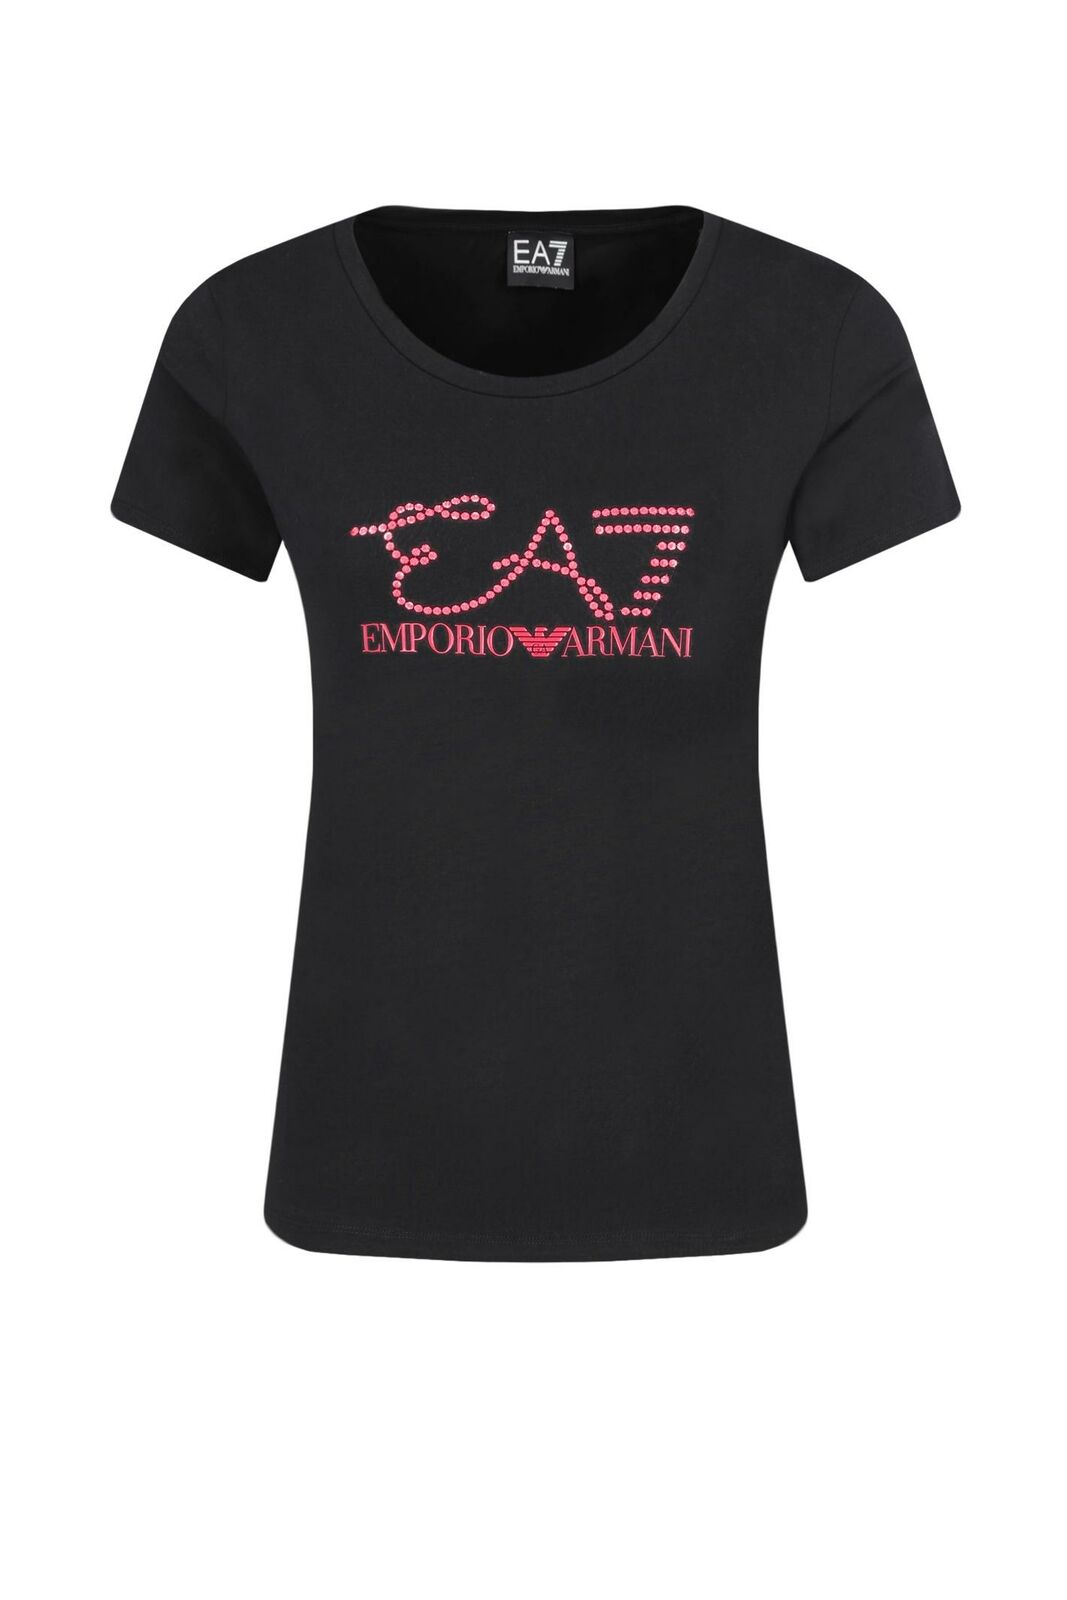 EA7 Emporio Armani 7 - T-Shirt damen schwarz Logo Maglia Slim